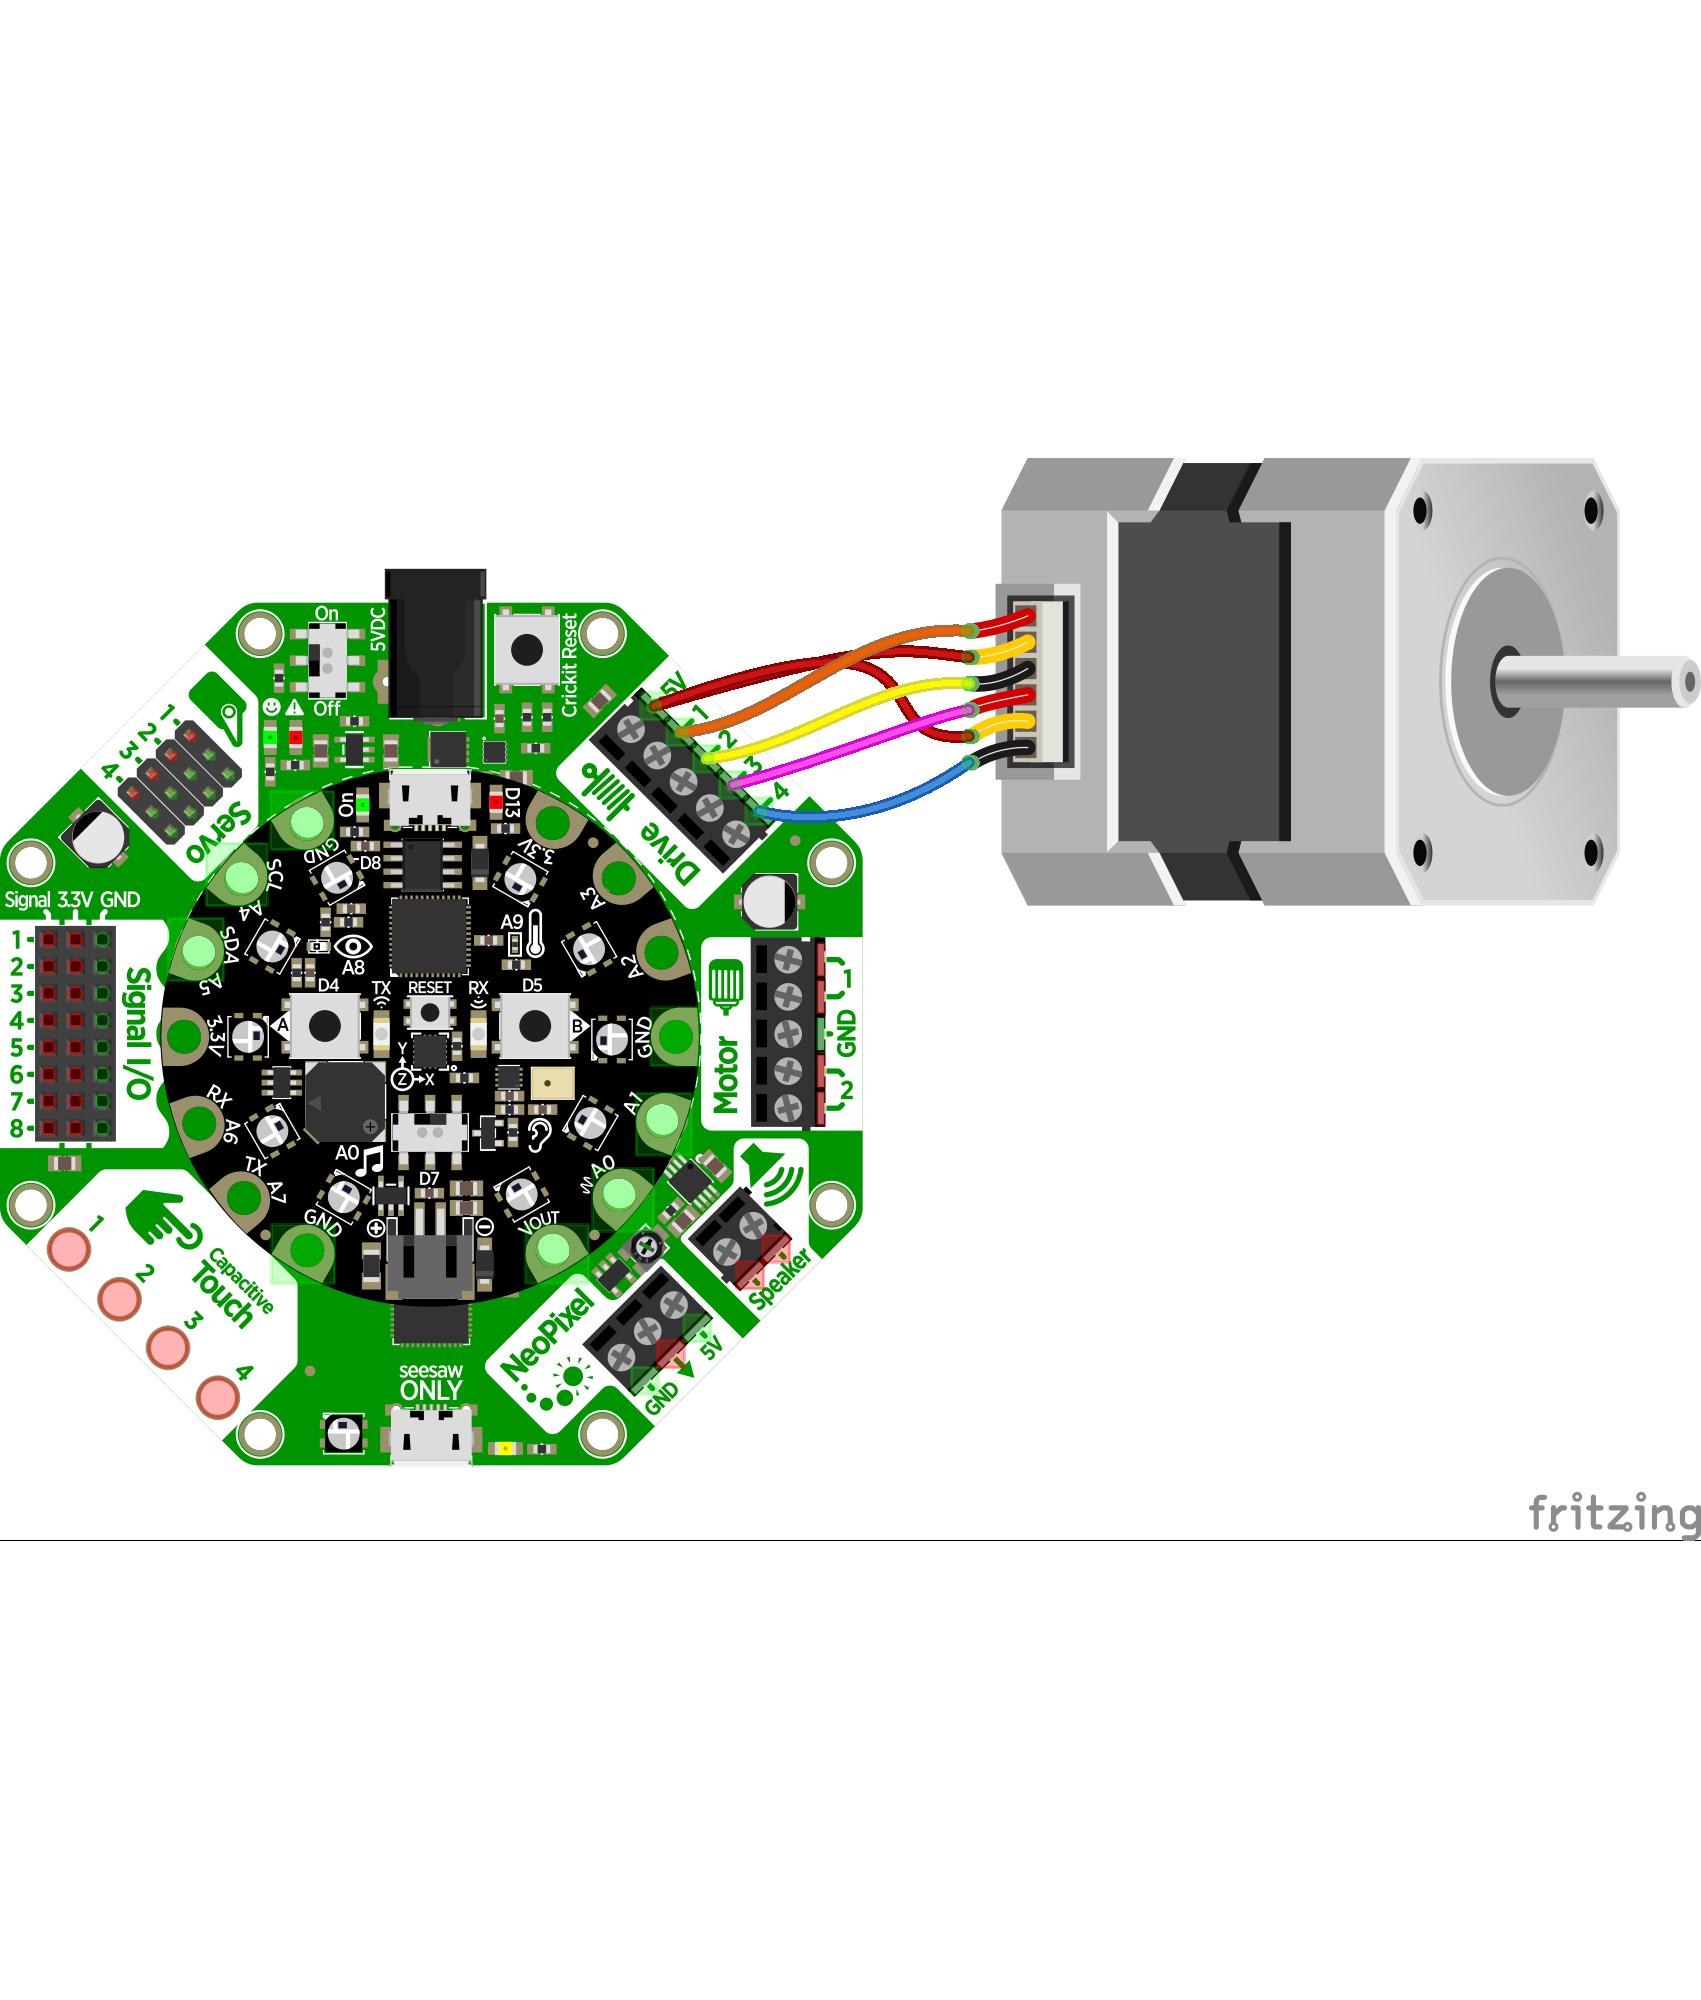 makecode_circuit_playground_unipolardrive_bb.png